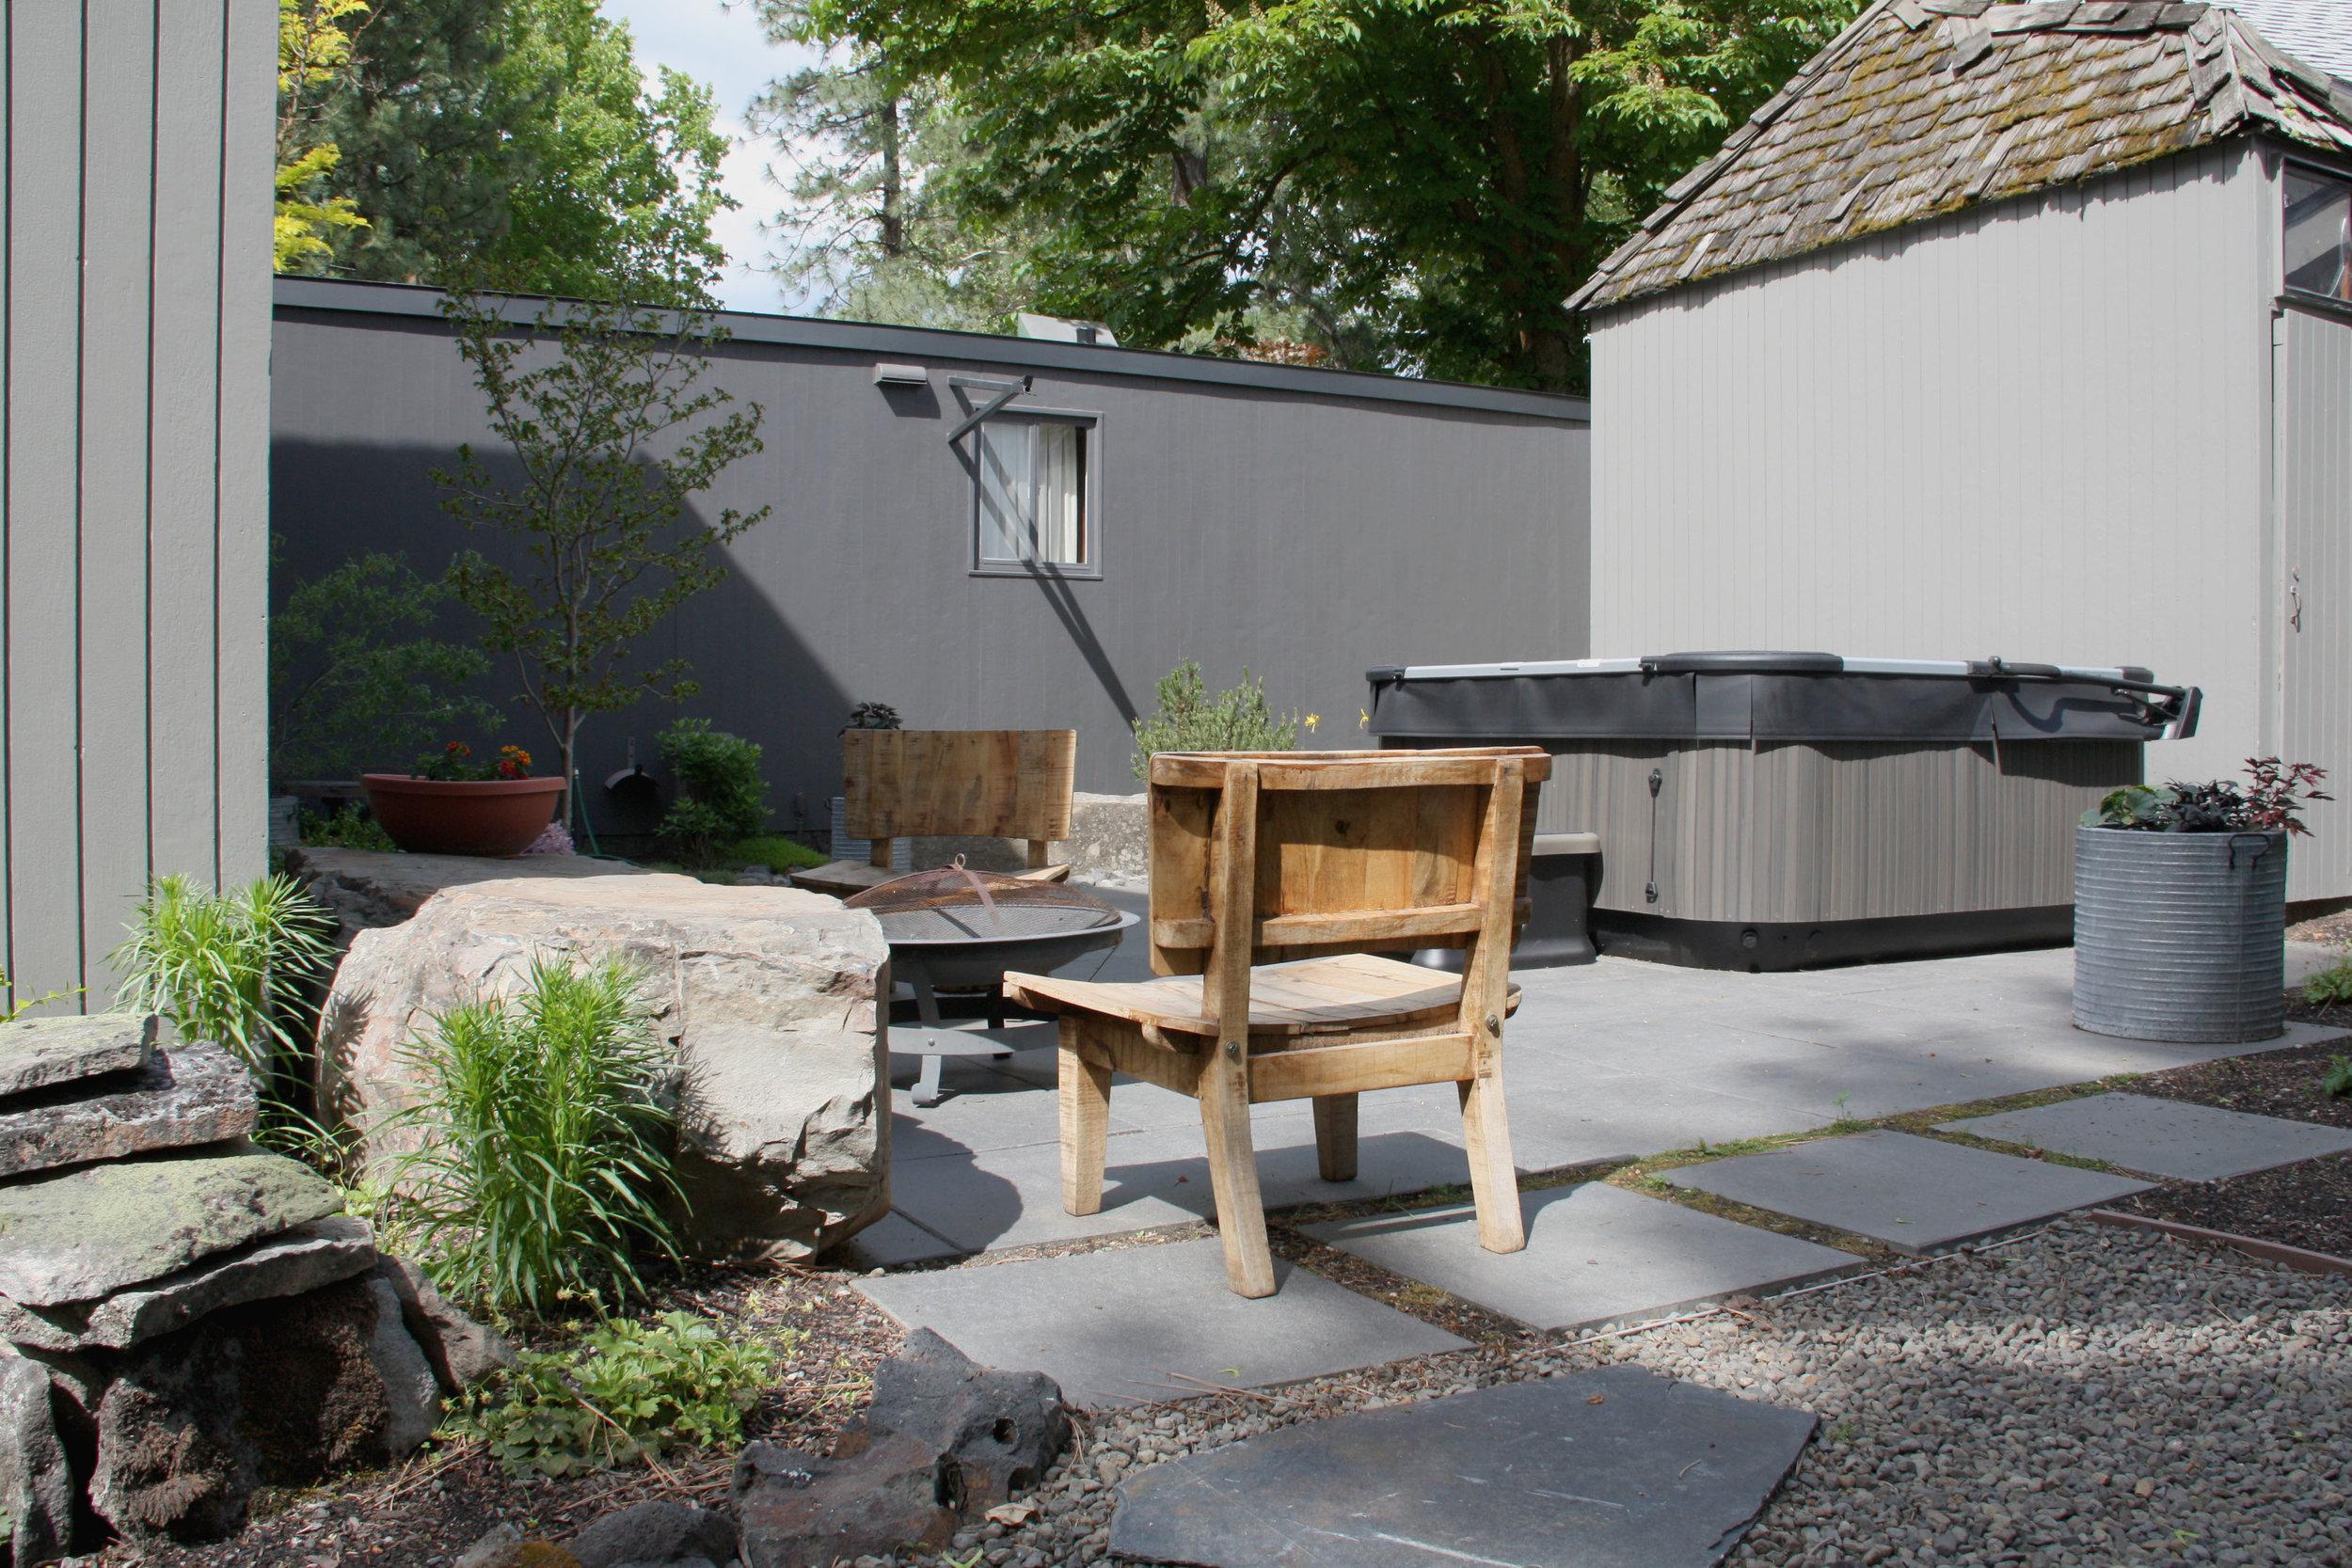 abbotsford-hydrapressed-paver-patio-1.JPG